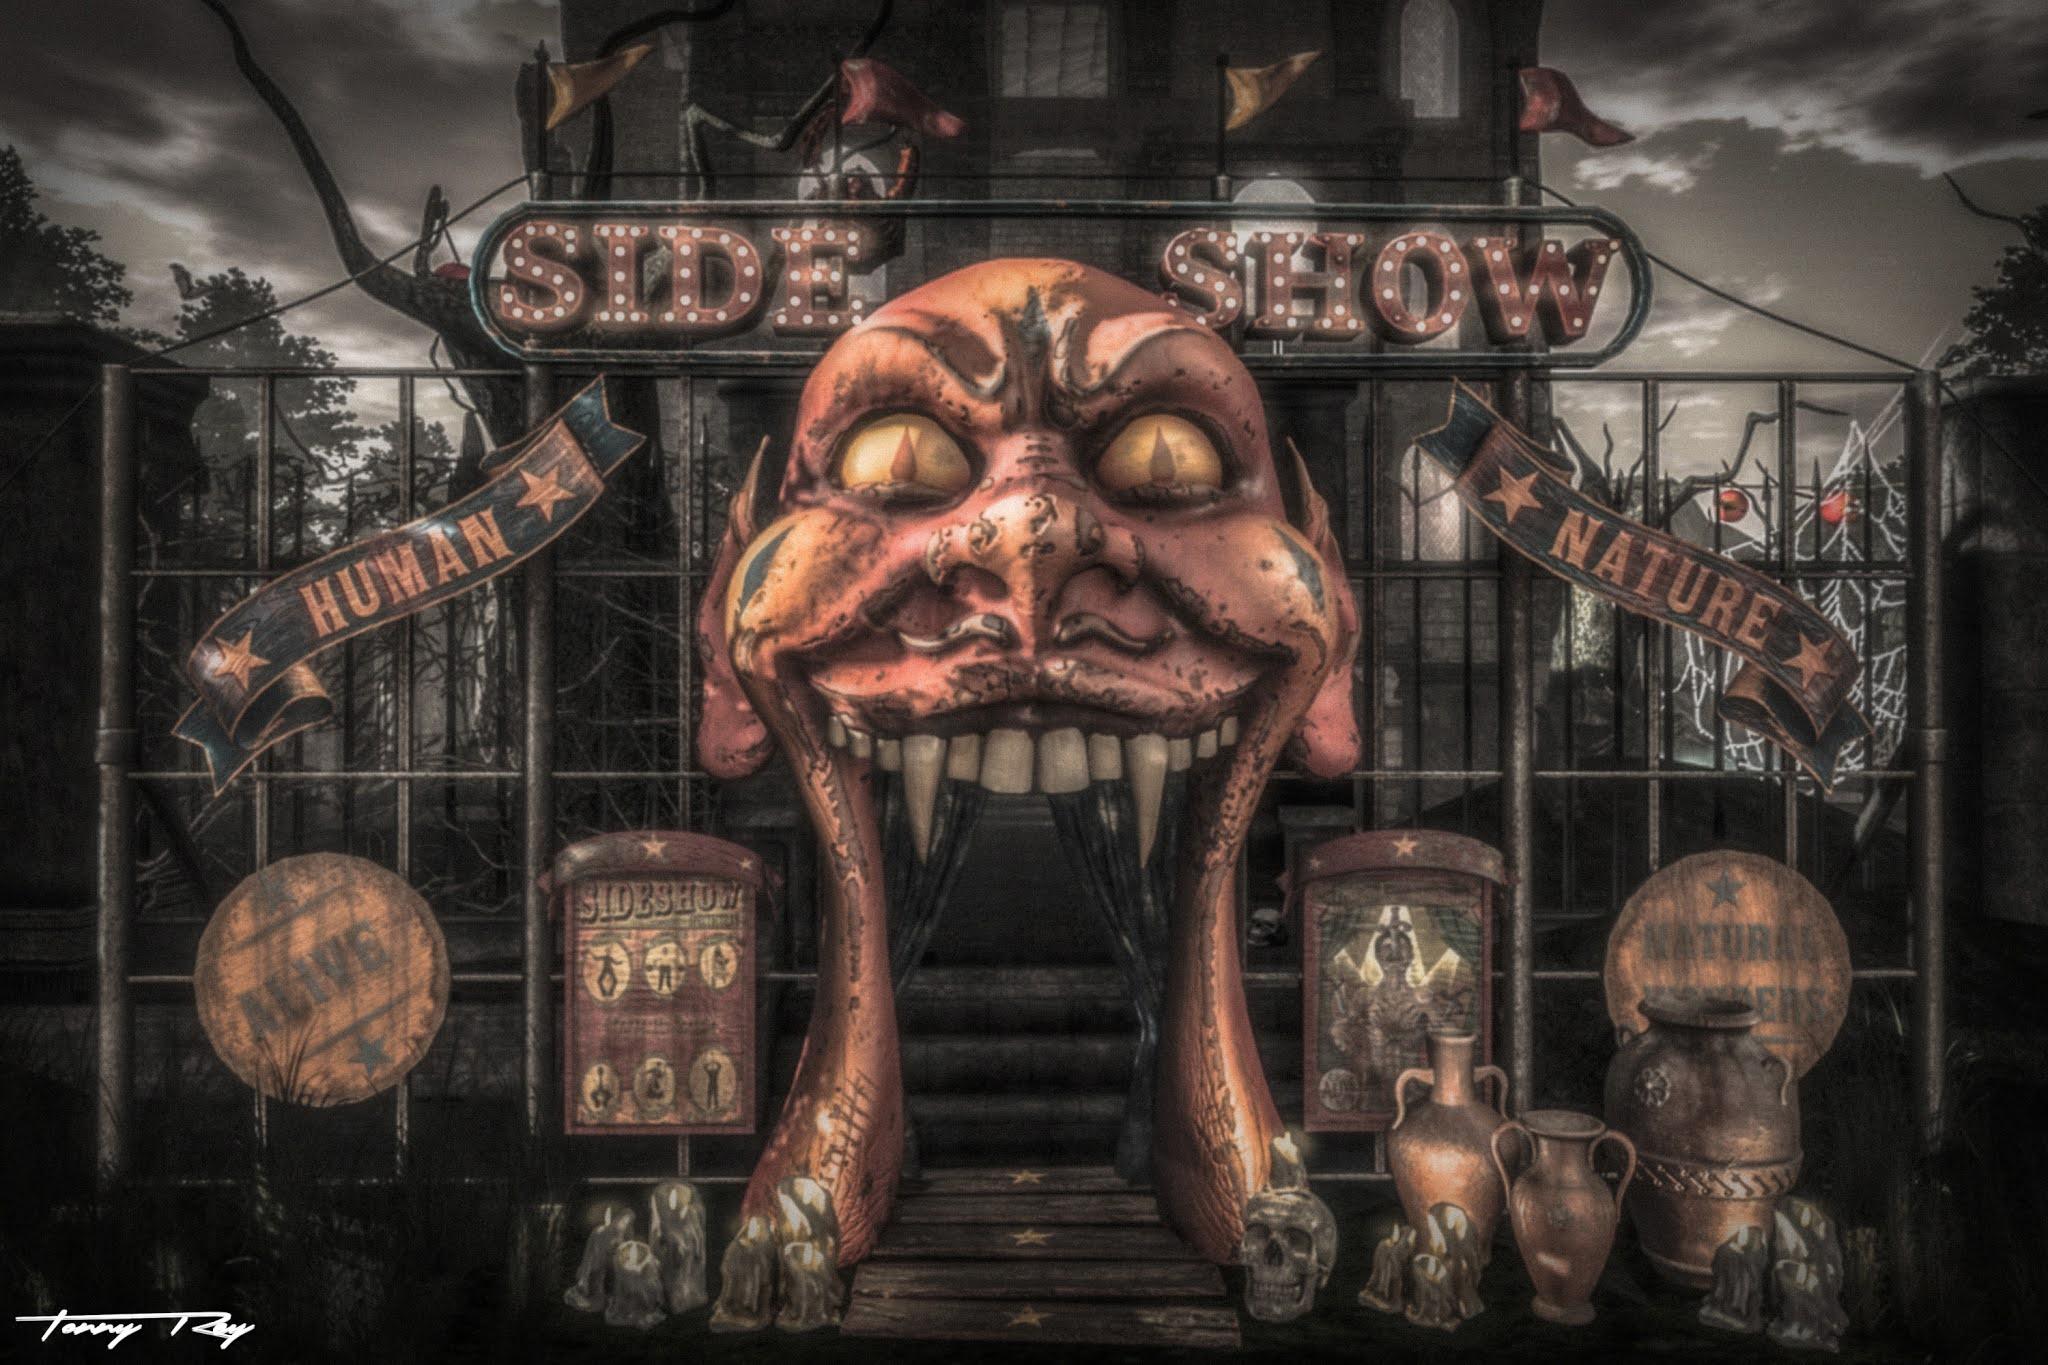 NTD - Side Show Gate...